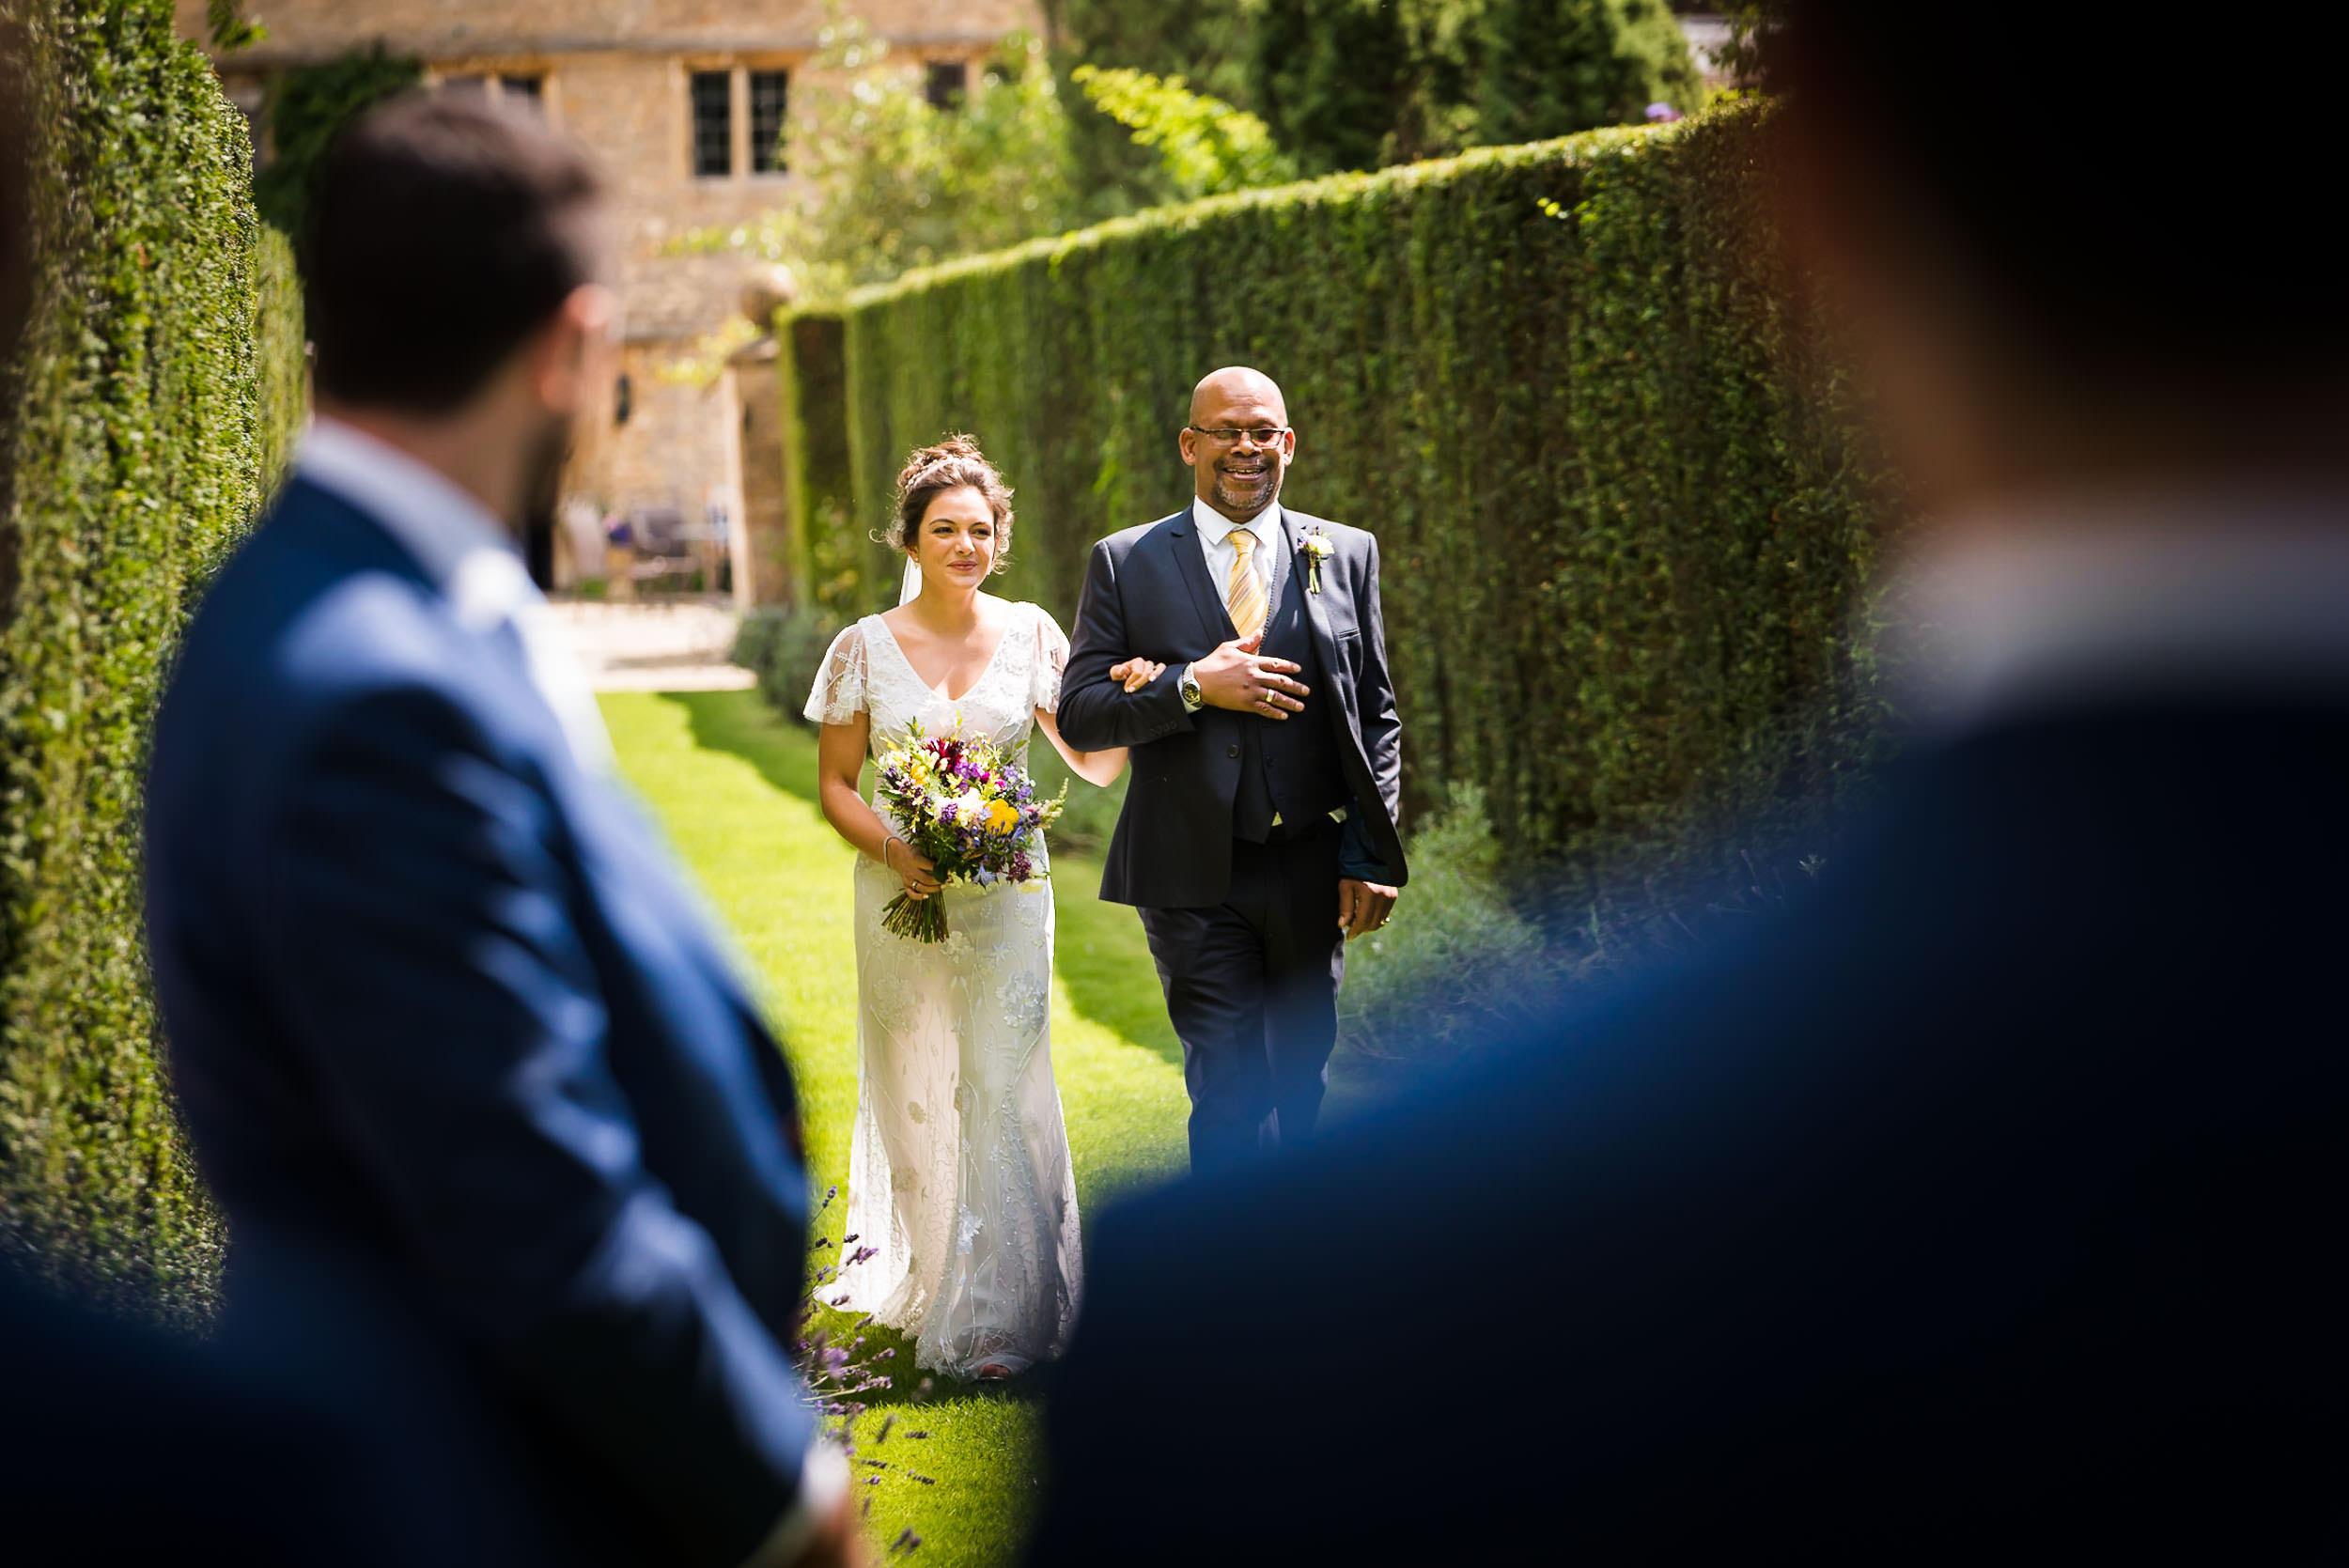 NC-20170805-2017-07-05_lara-and-nick-wedding-0233.jpg